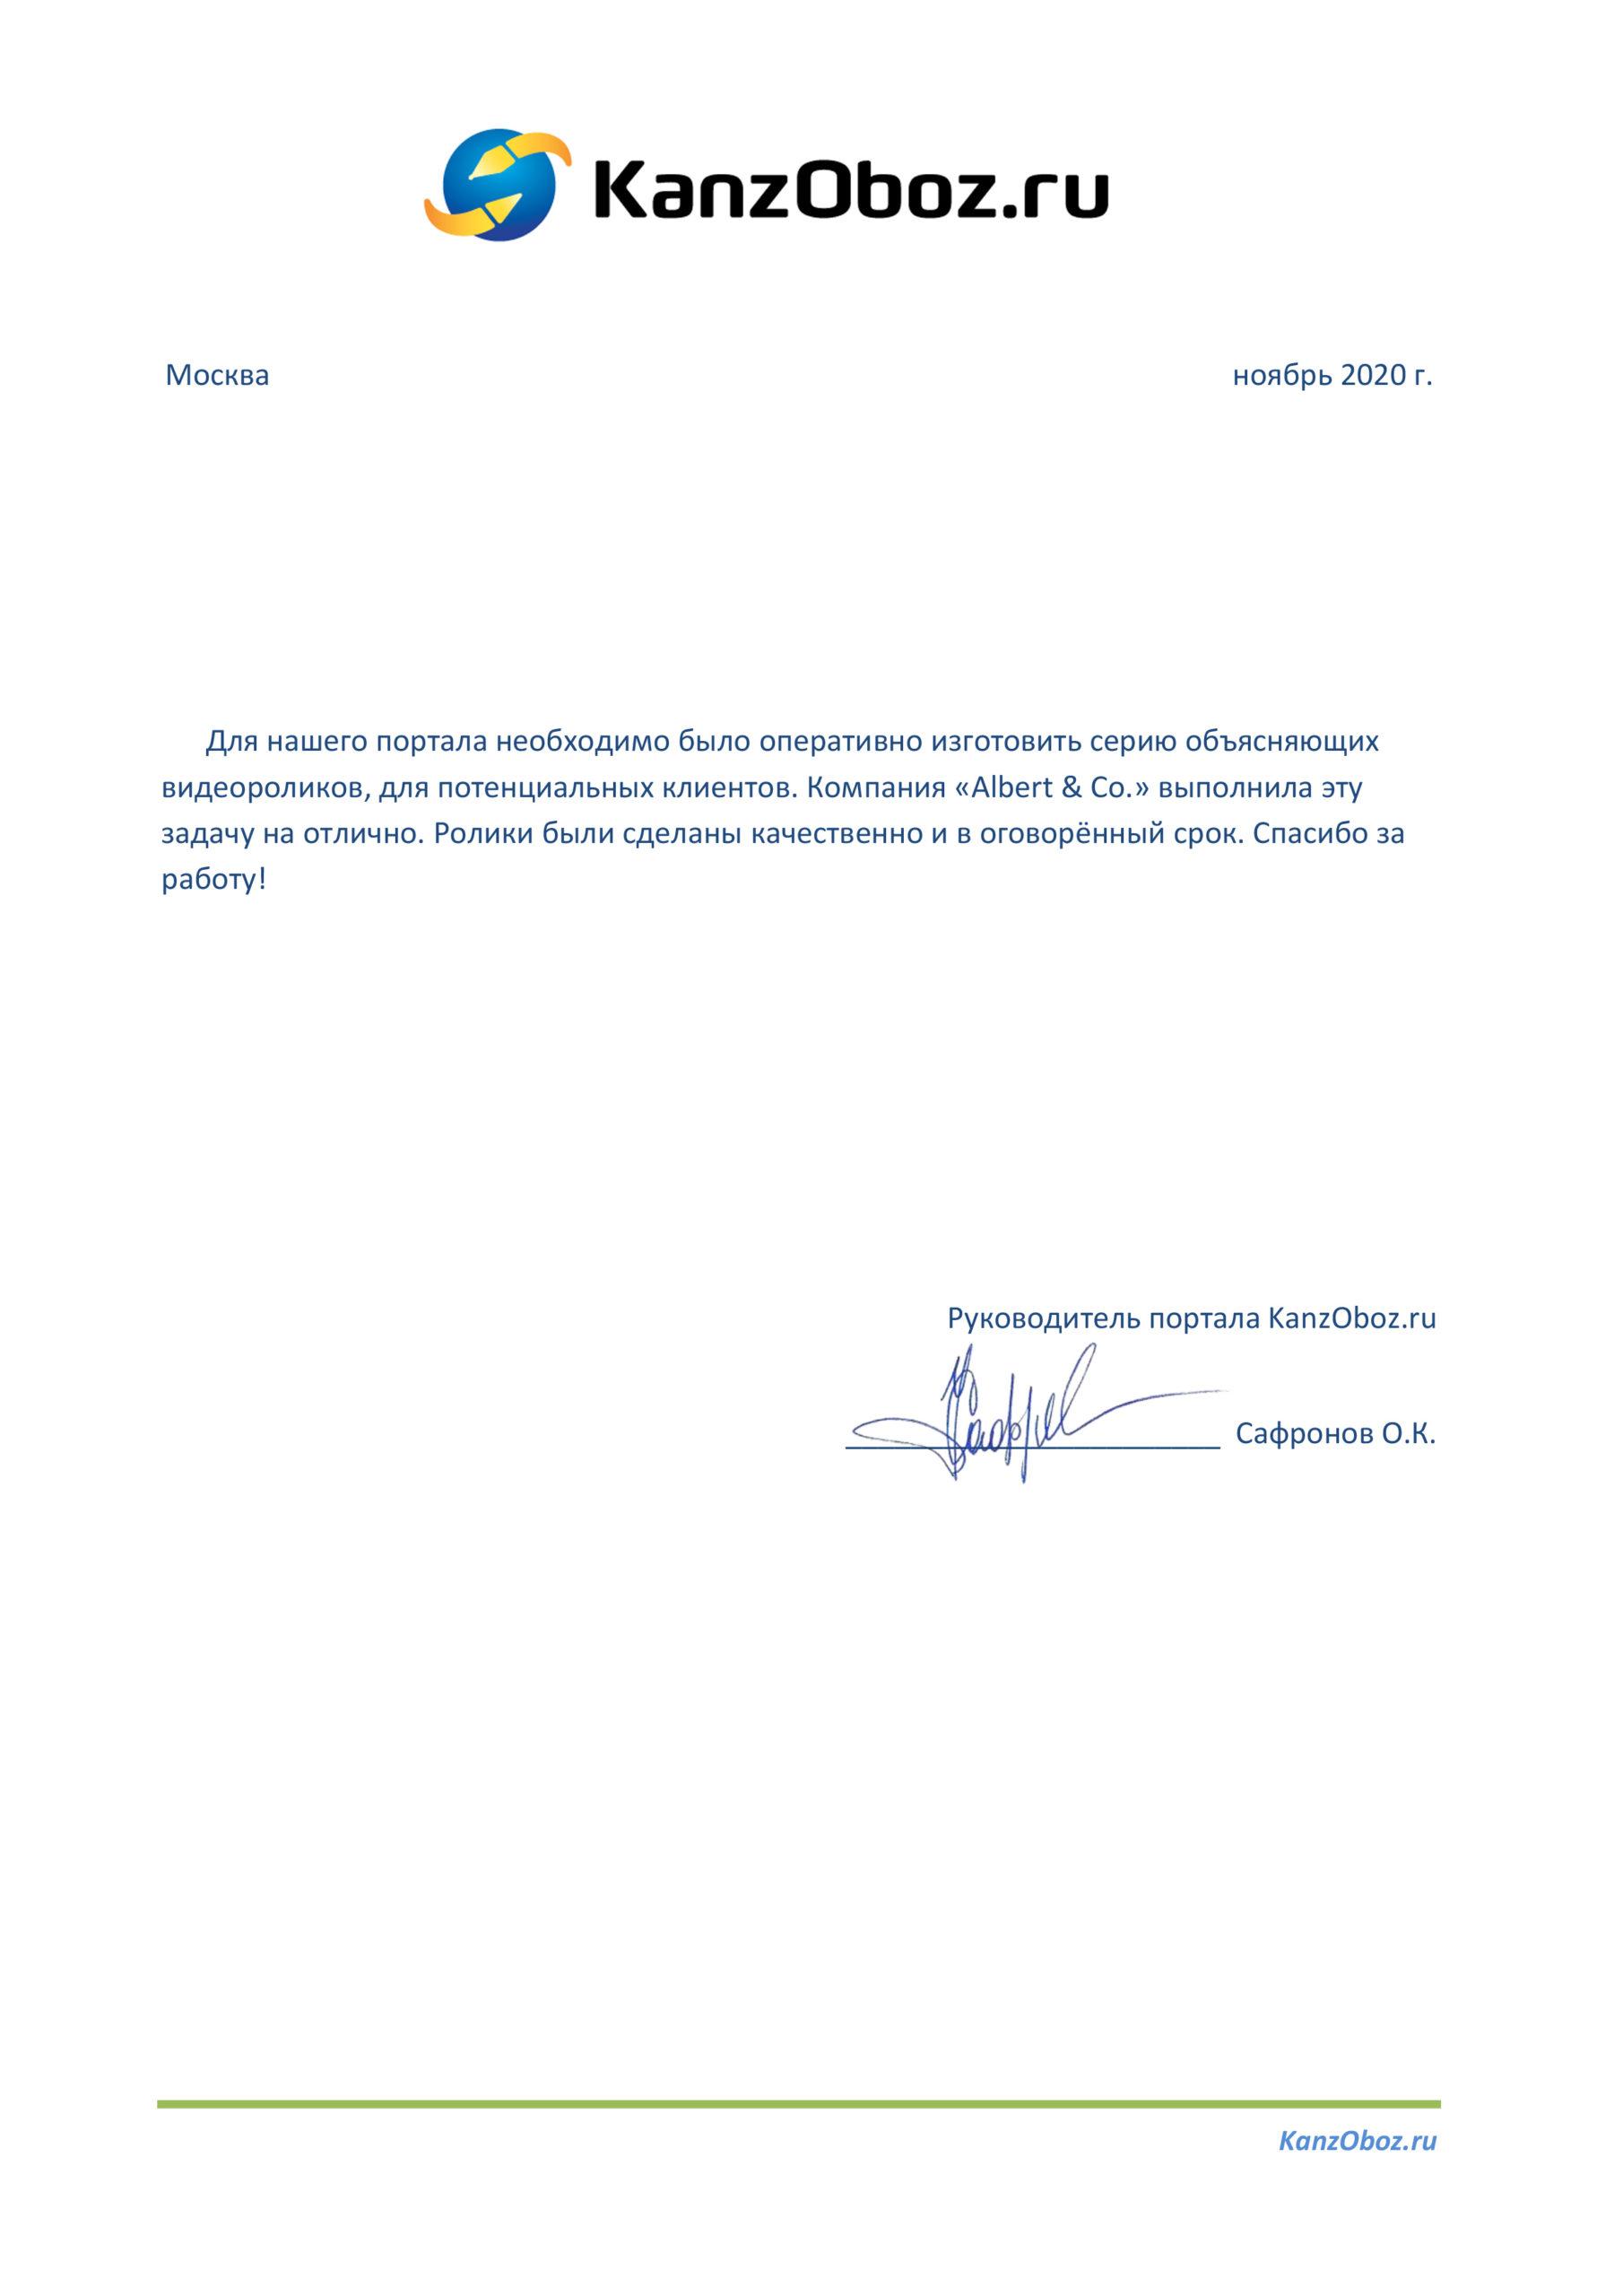 Albert & Co отзыв о работе от портала Канцобоз